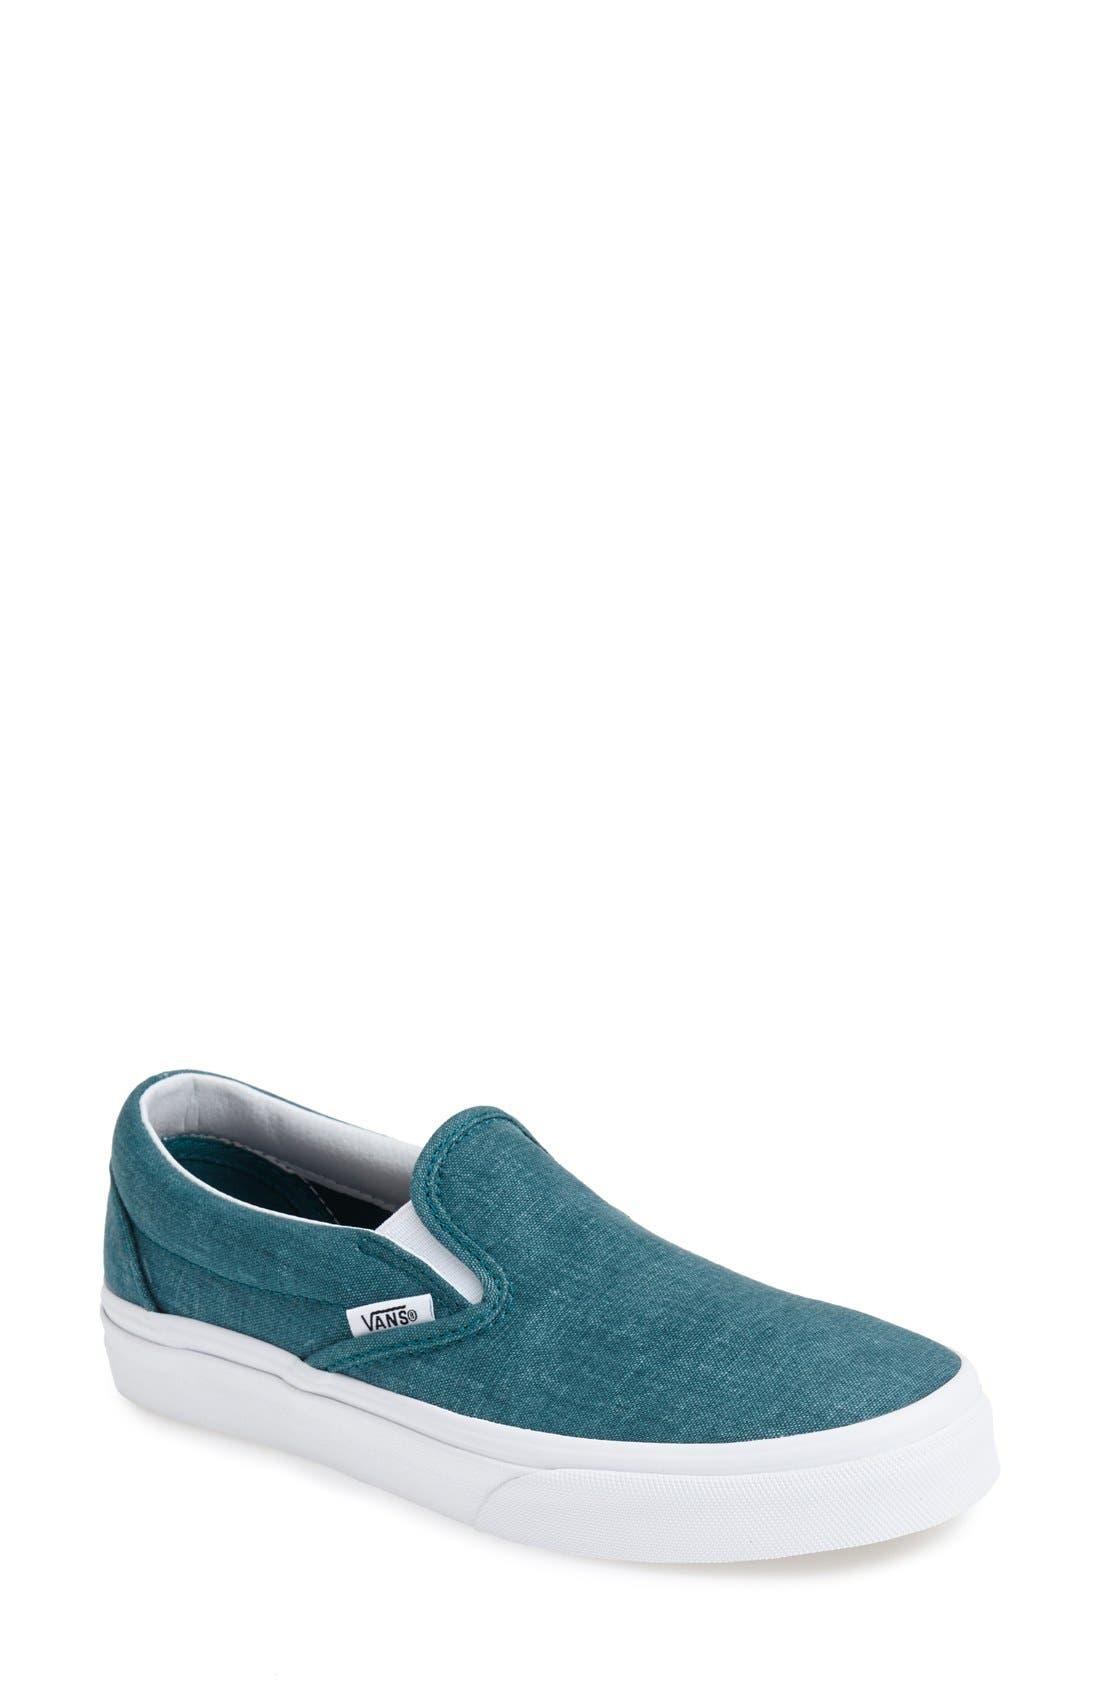 Main Image - Vans Washed Canvas Slip-On Sneaker (Women)